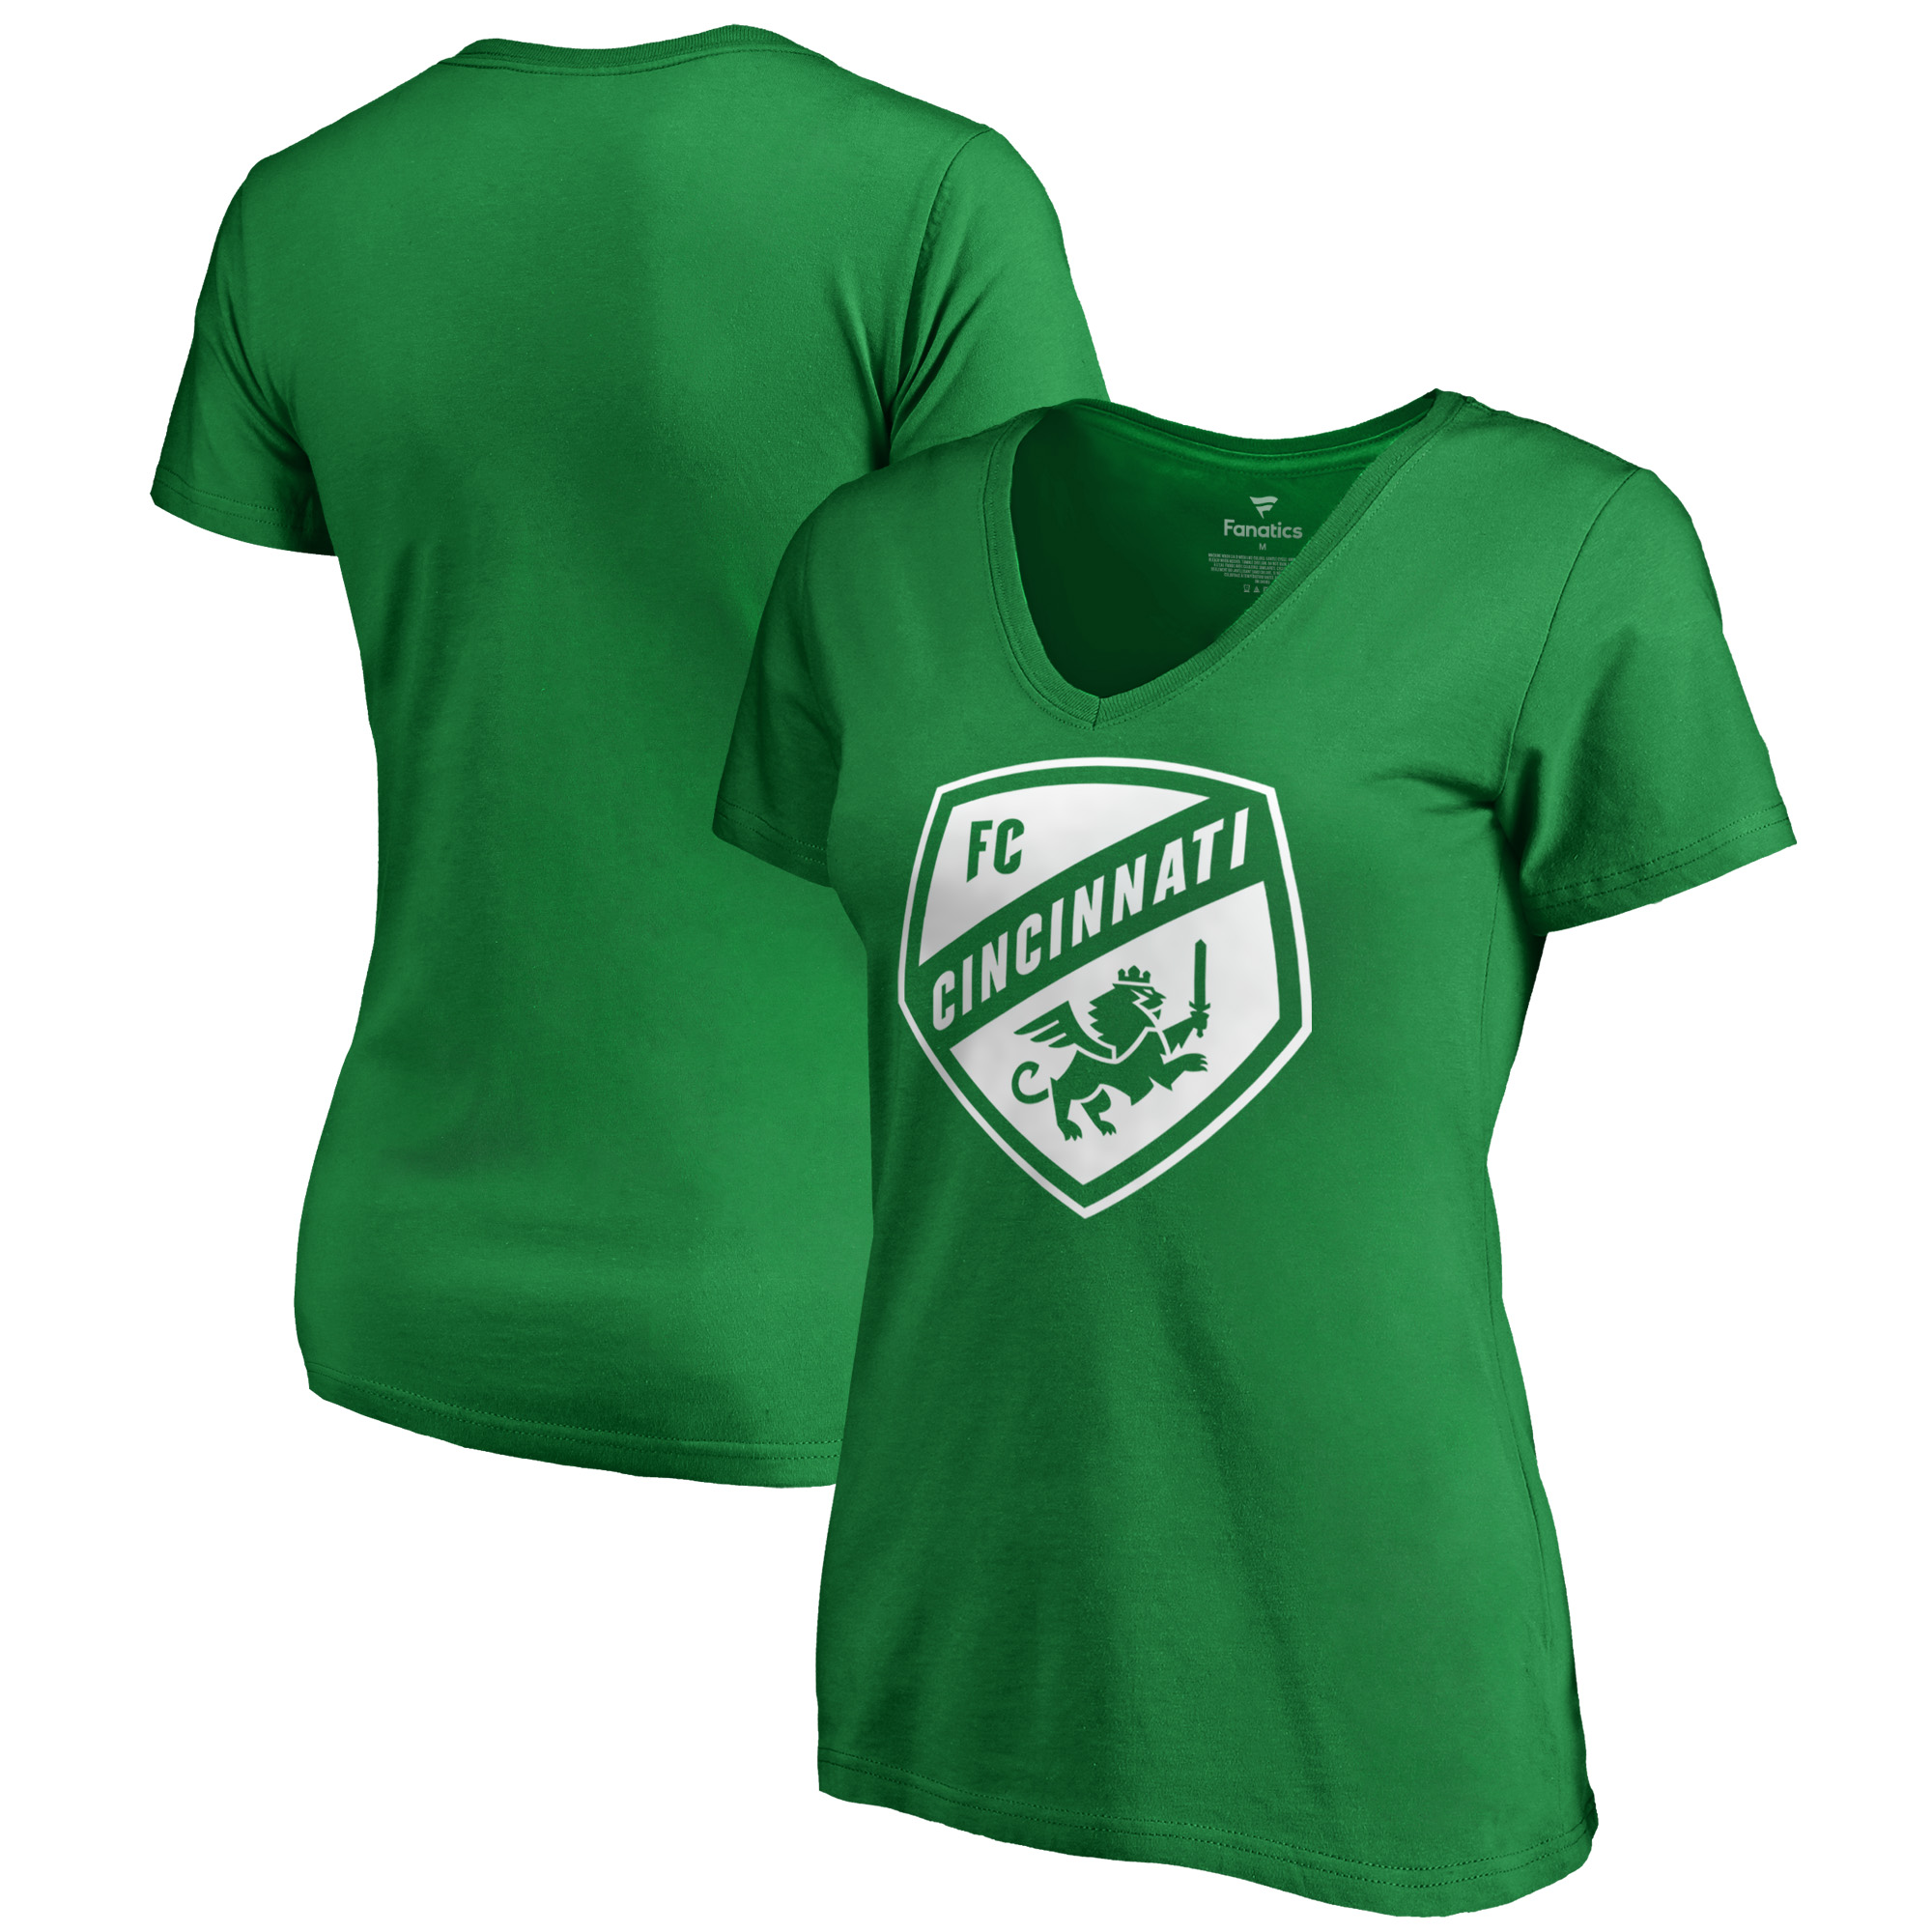 FC Cincinnati Fanatics Branded Women's St. Patrick's Day White Logo Short Sleeve V-Neck T-Shirt - Kelly Green